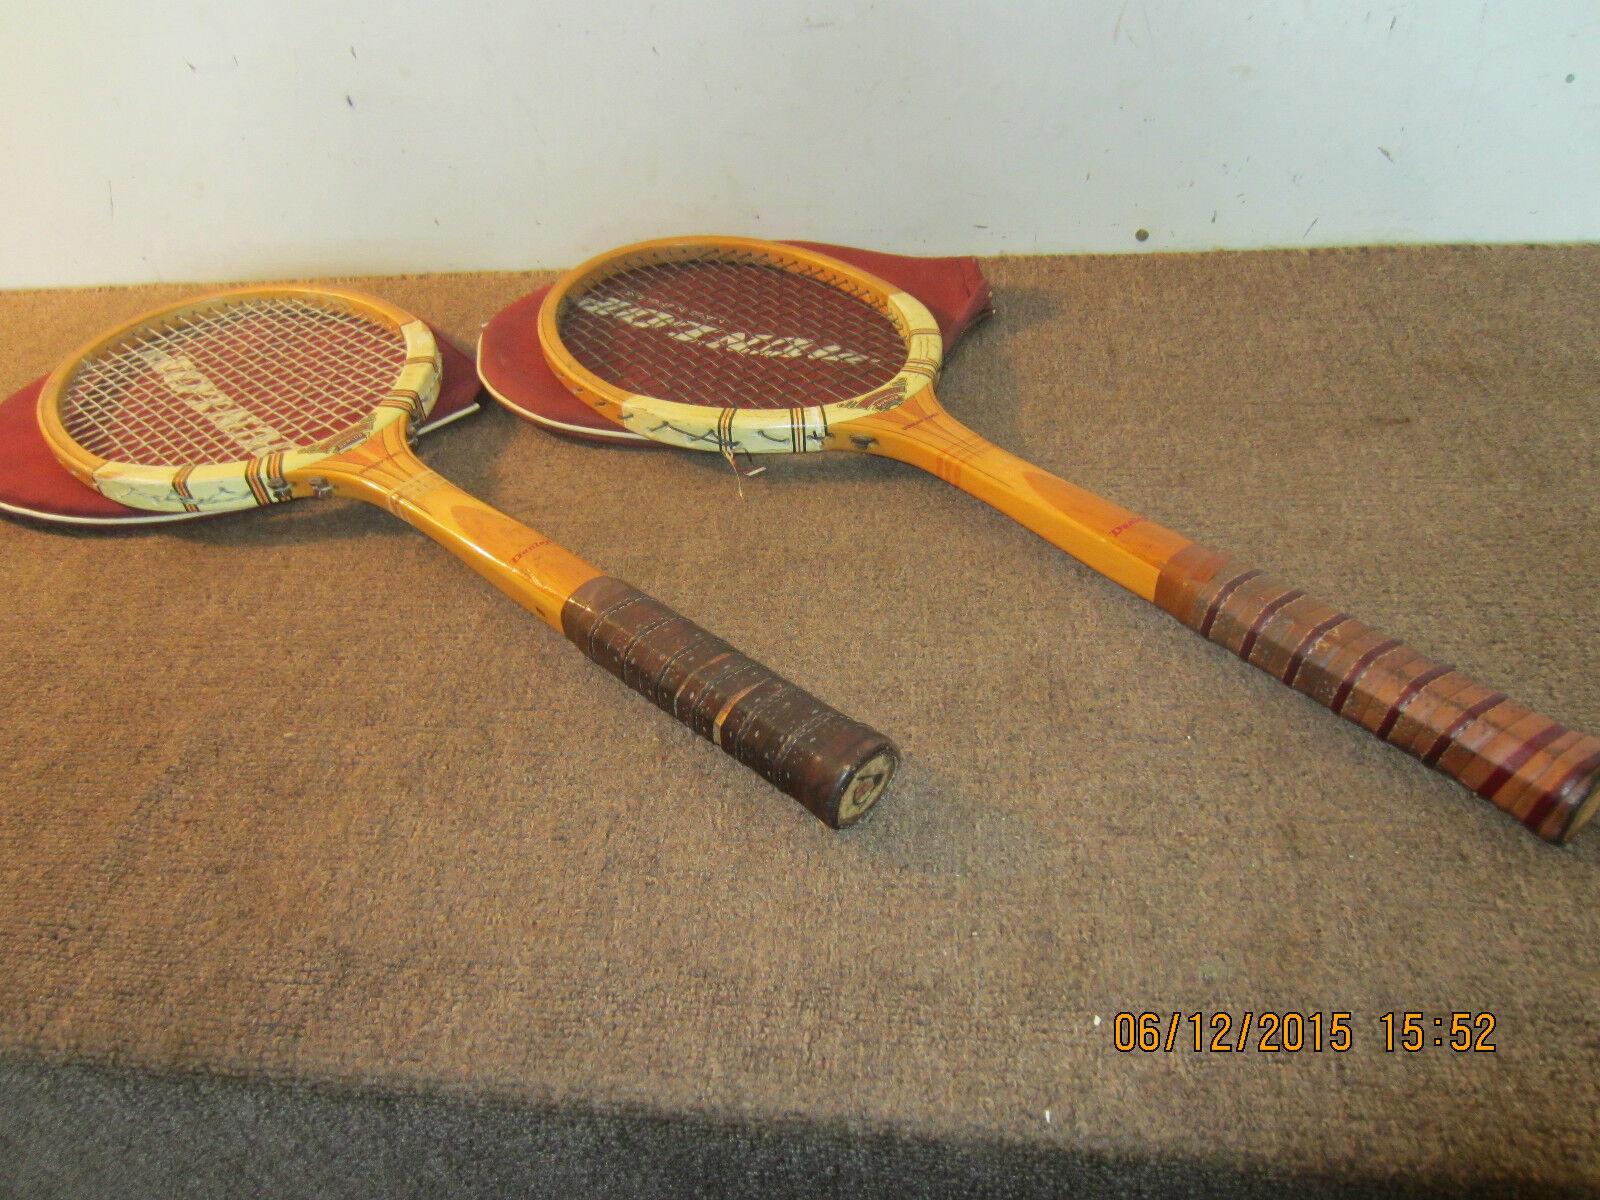 Par De, British 50's Dunlop Raquetas De Tenis